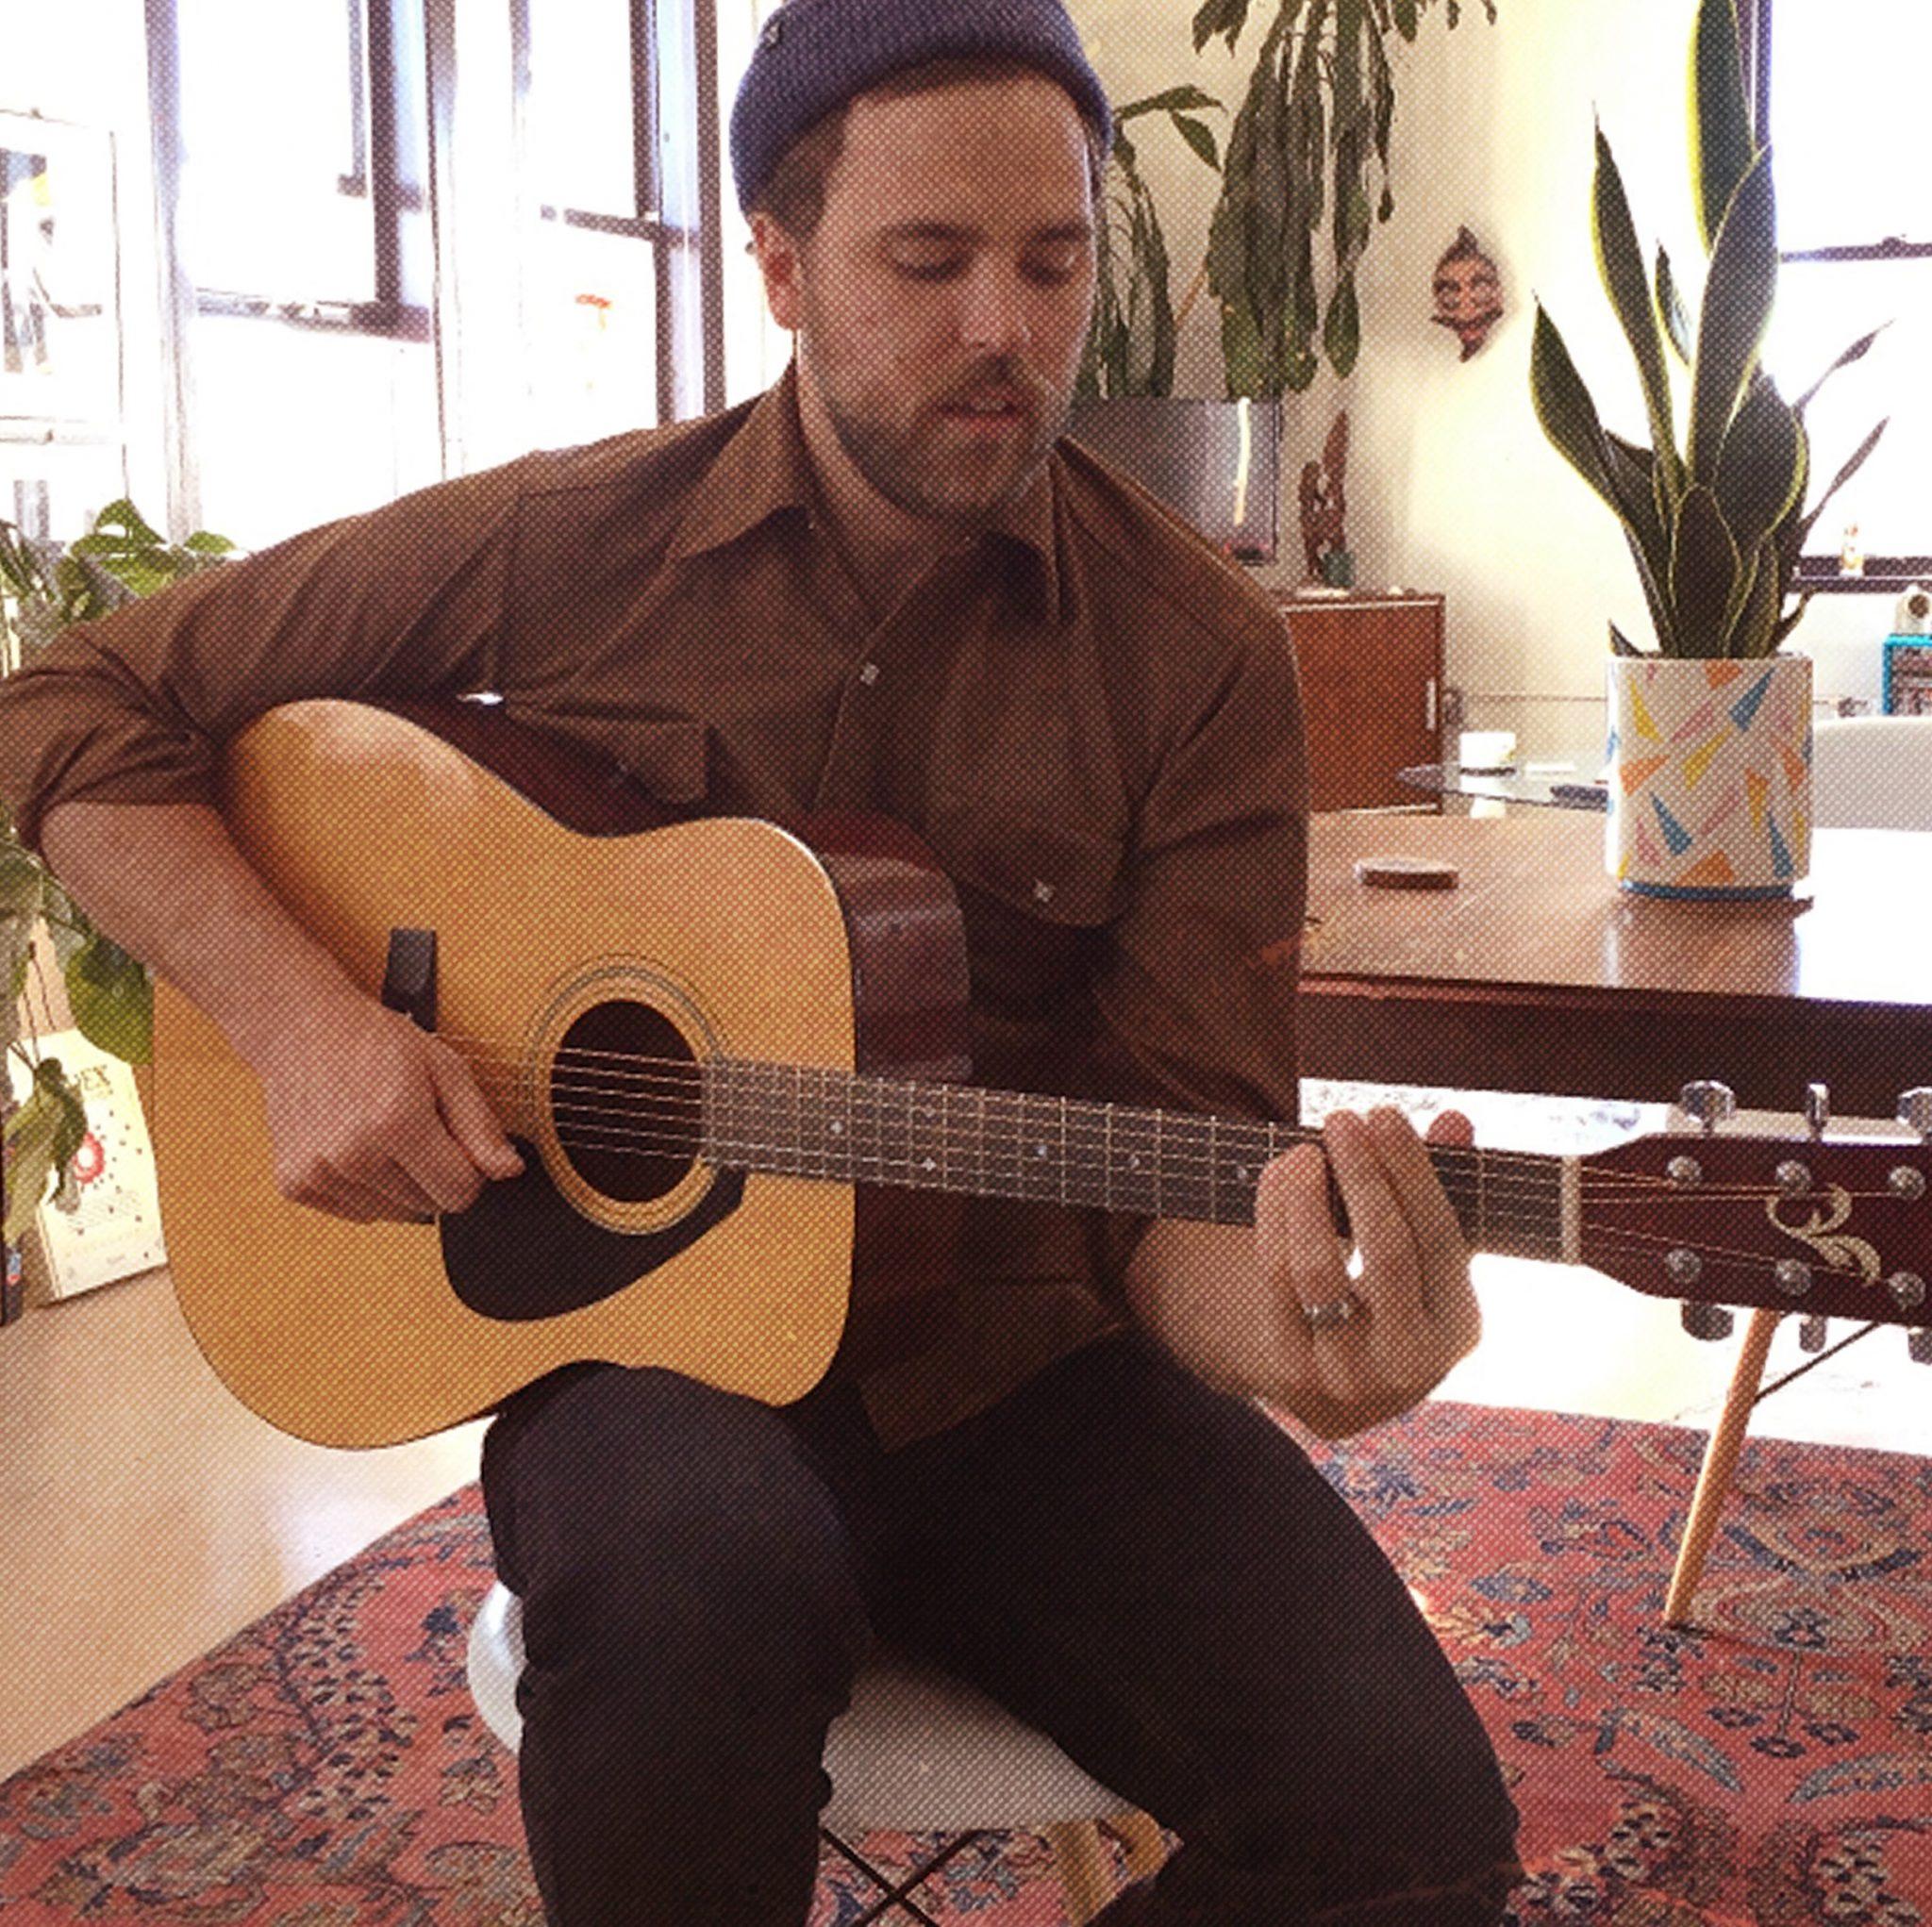 Secret Society of Music: Bryan Daines